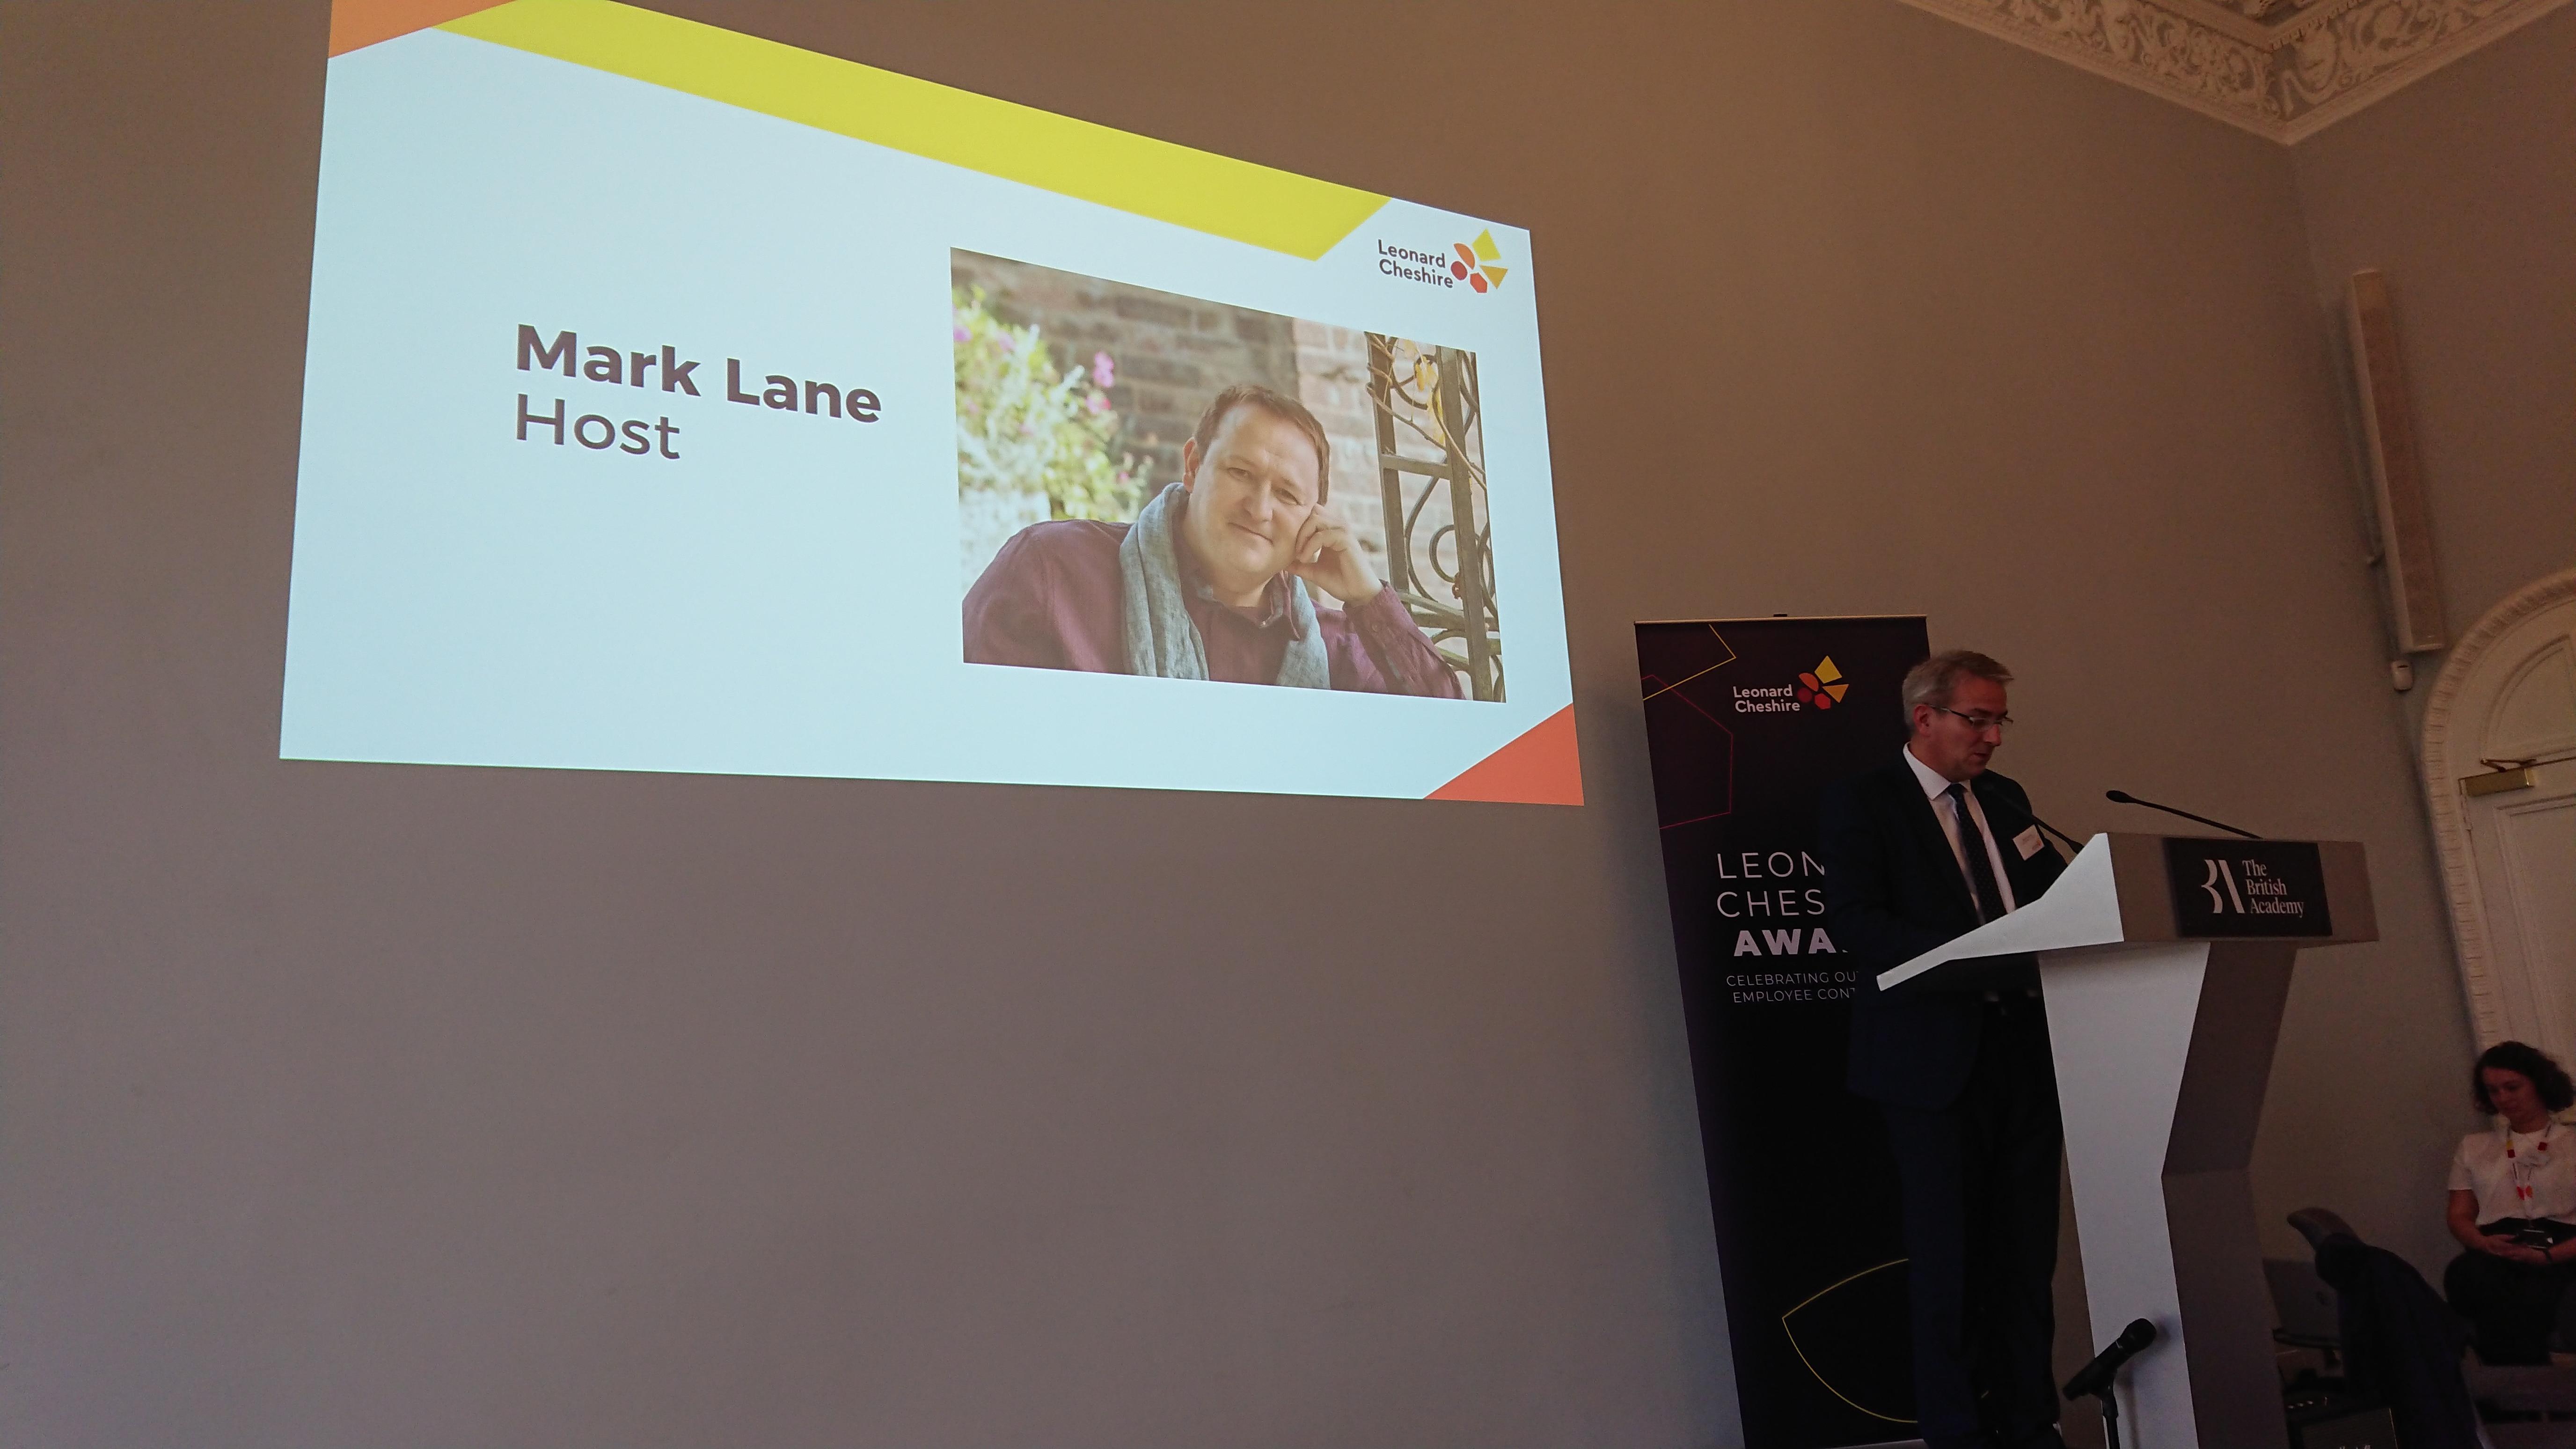 Mark Lane hosts Leonard Cheshire Awards